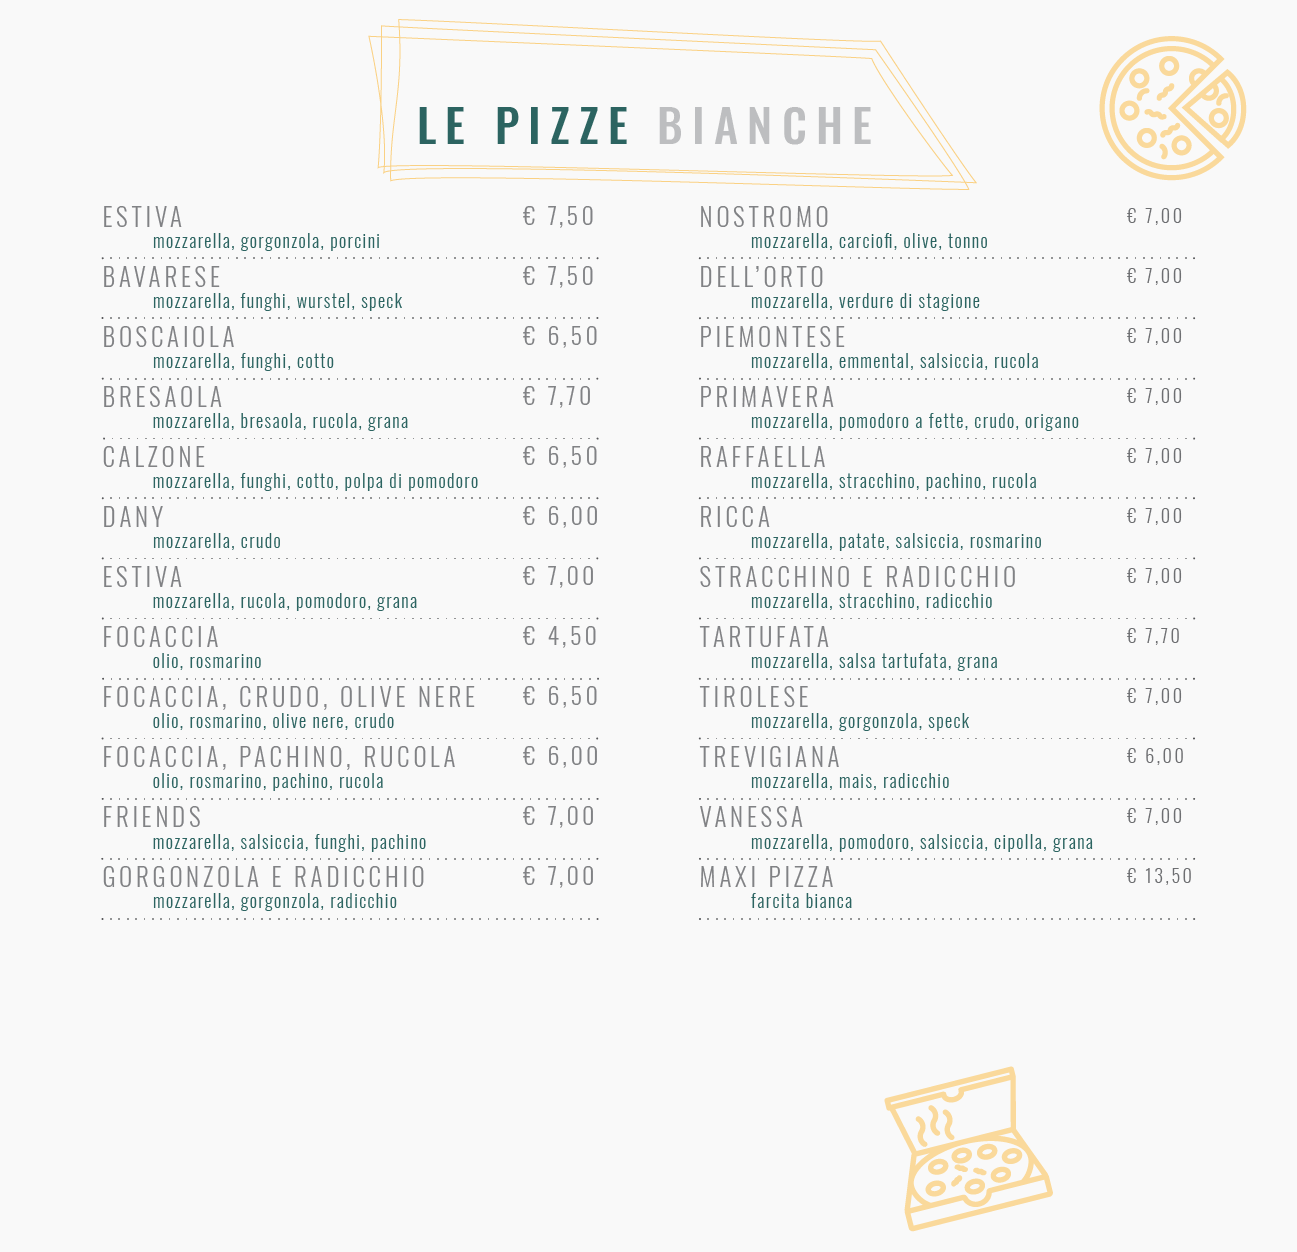 menu-pizze-bianche